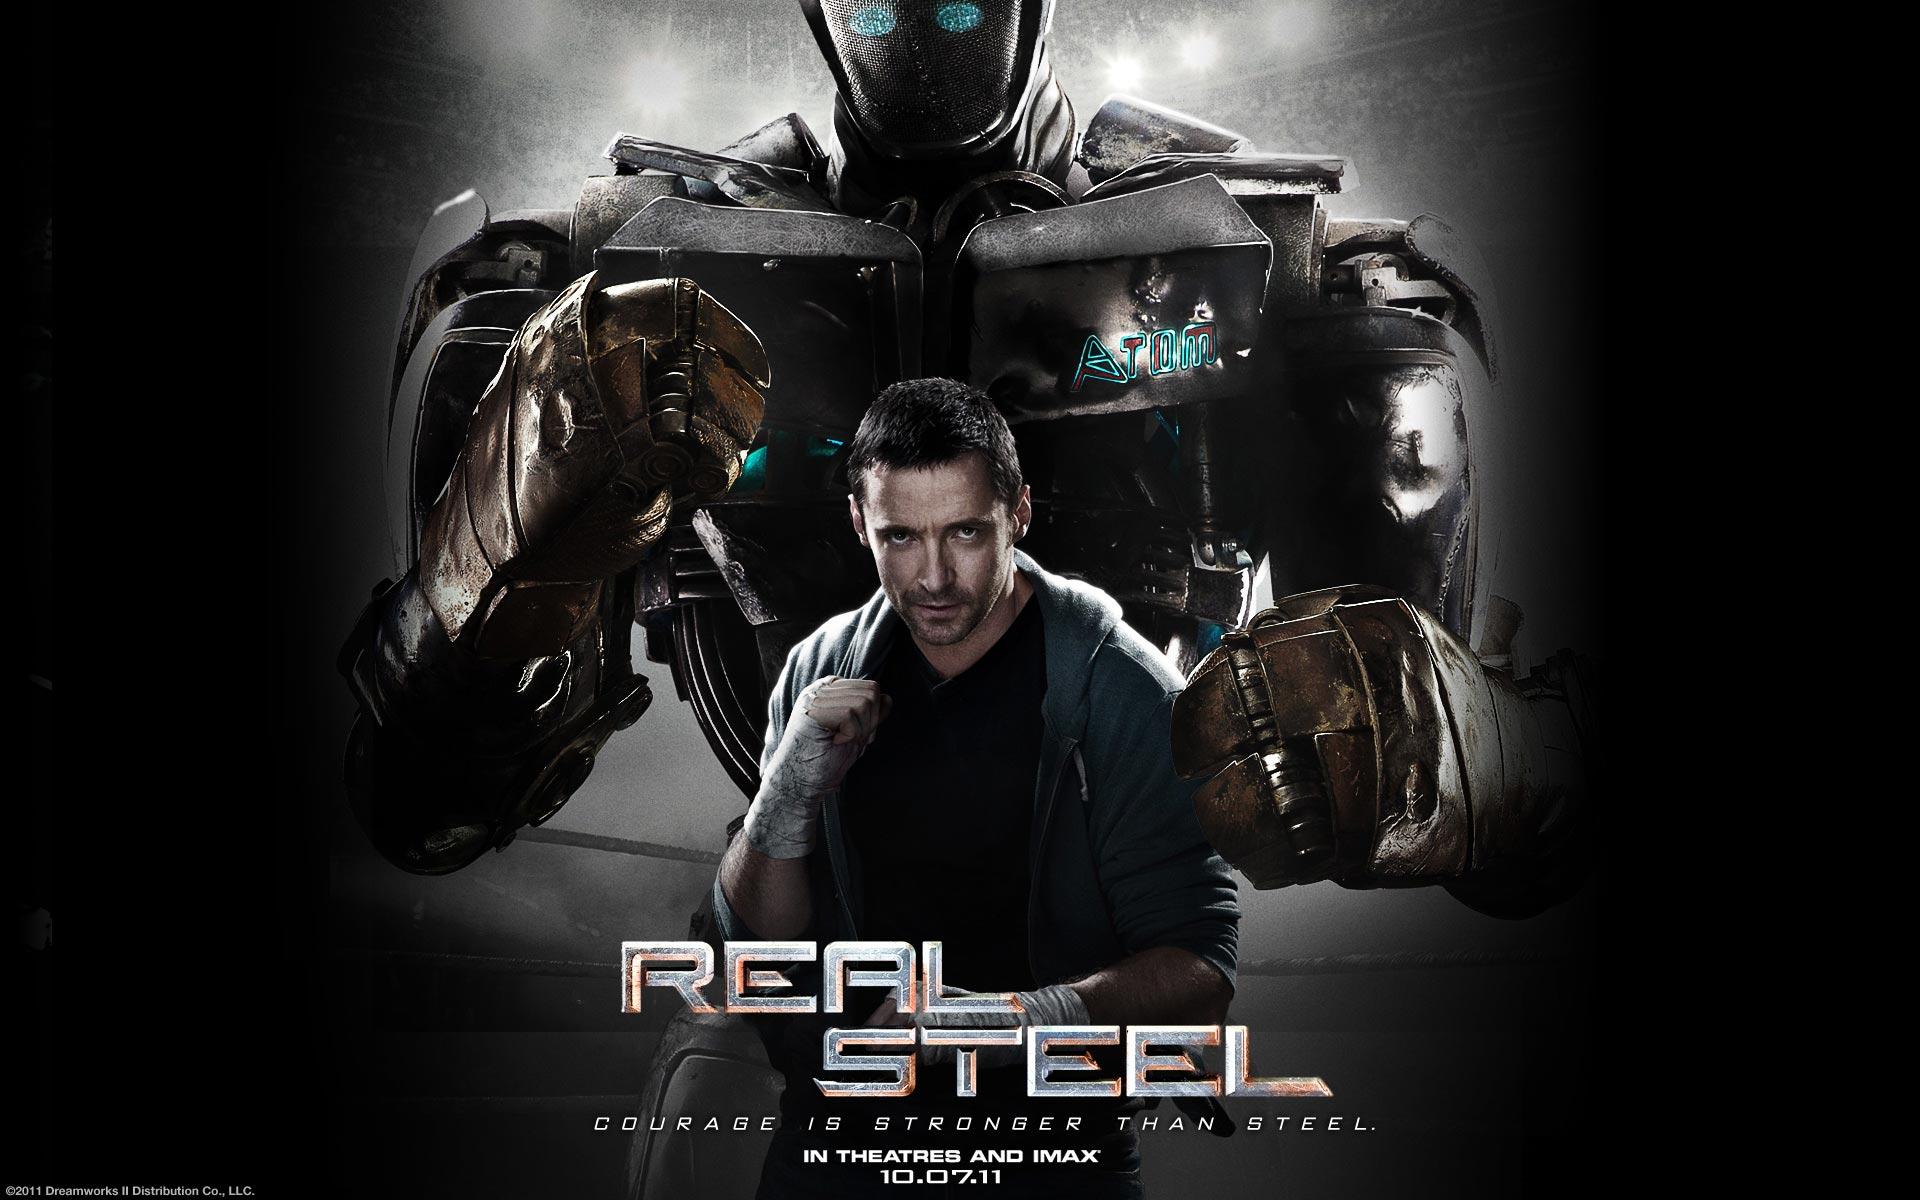 sci-fi spotlight: real steel - axanar productions